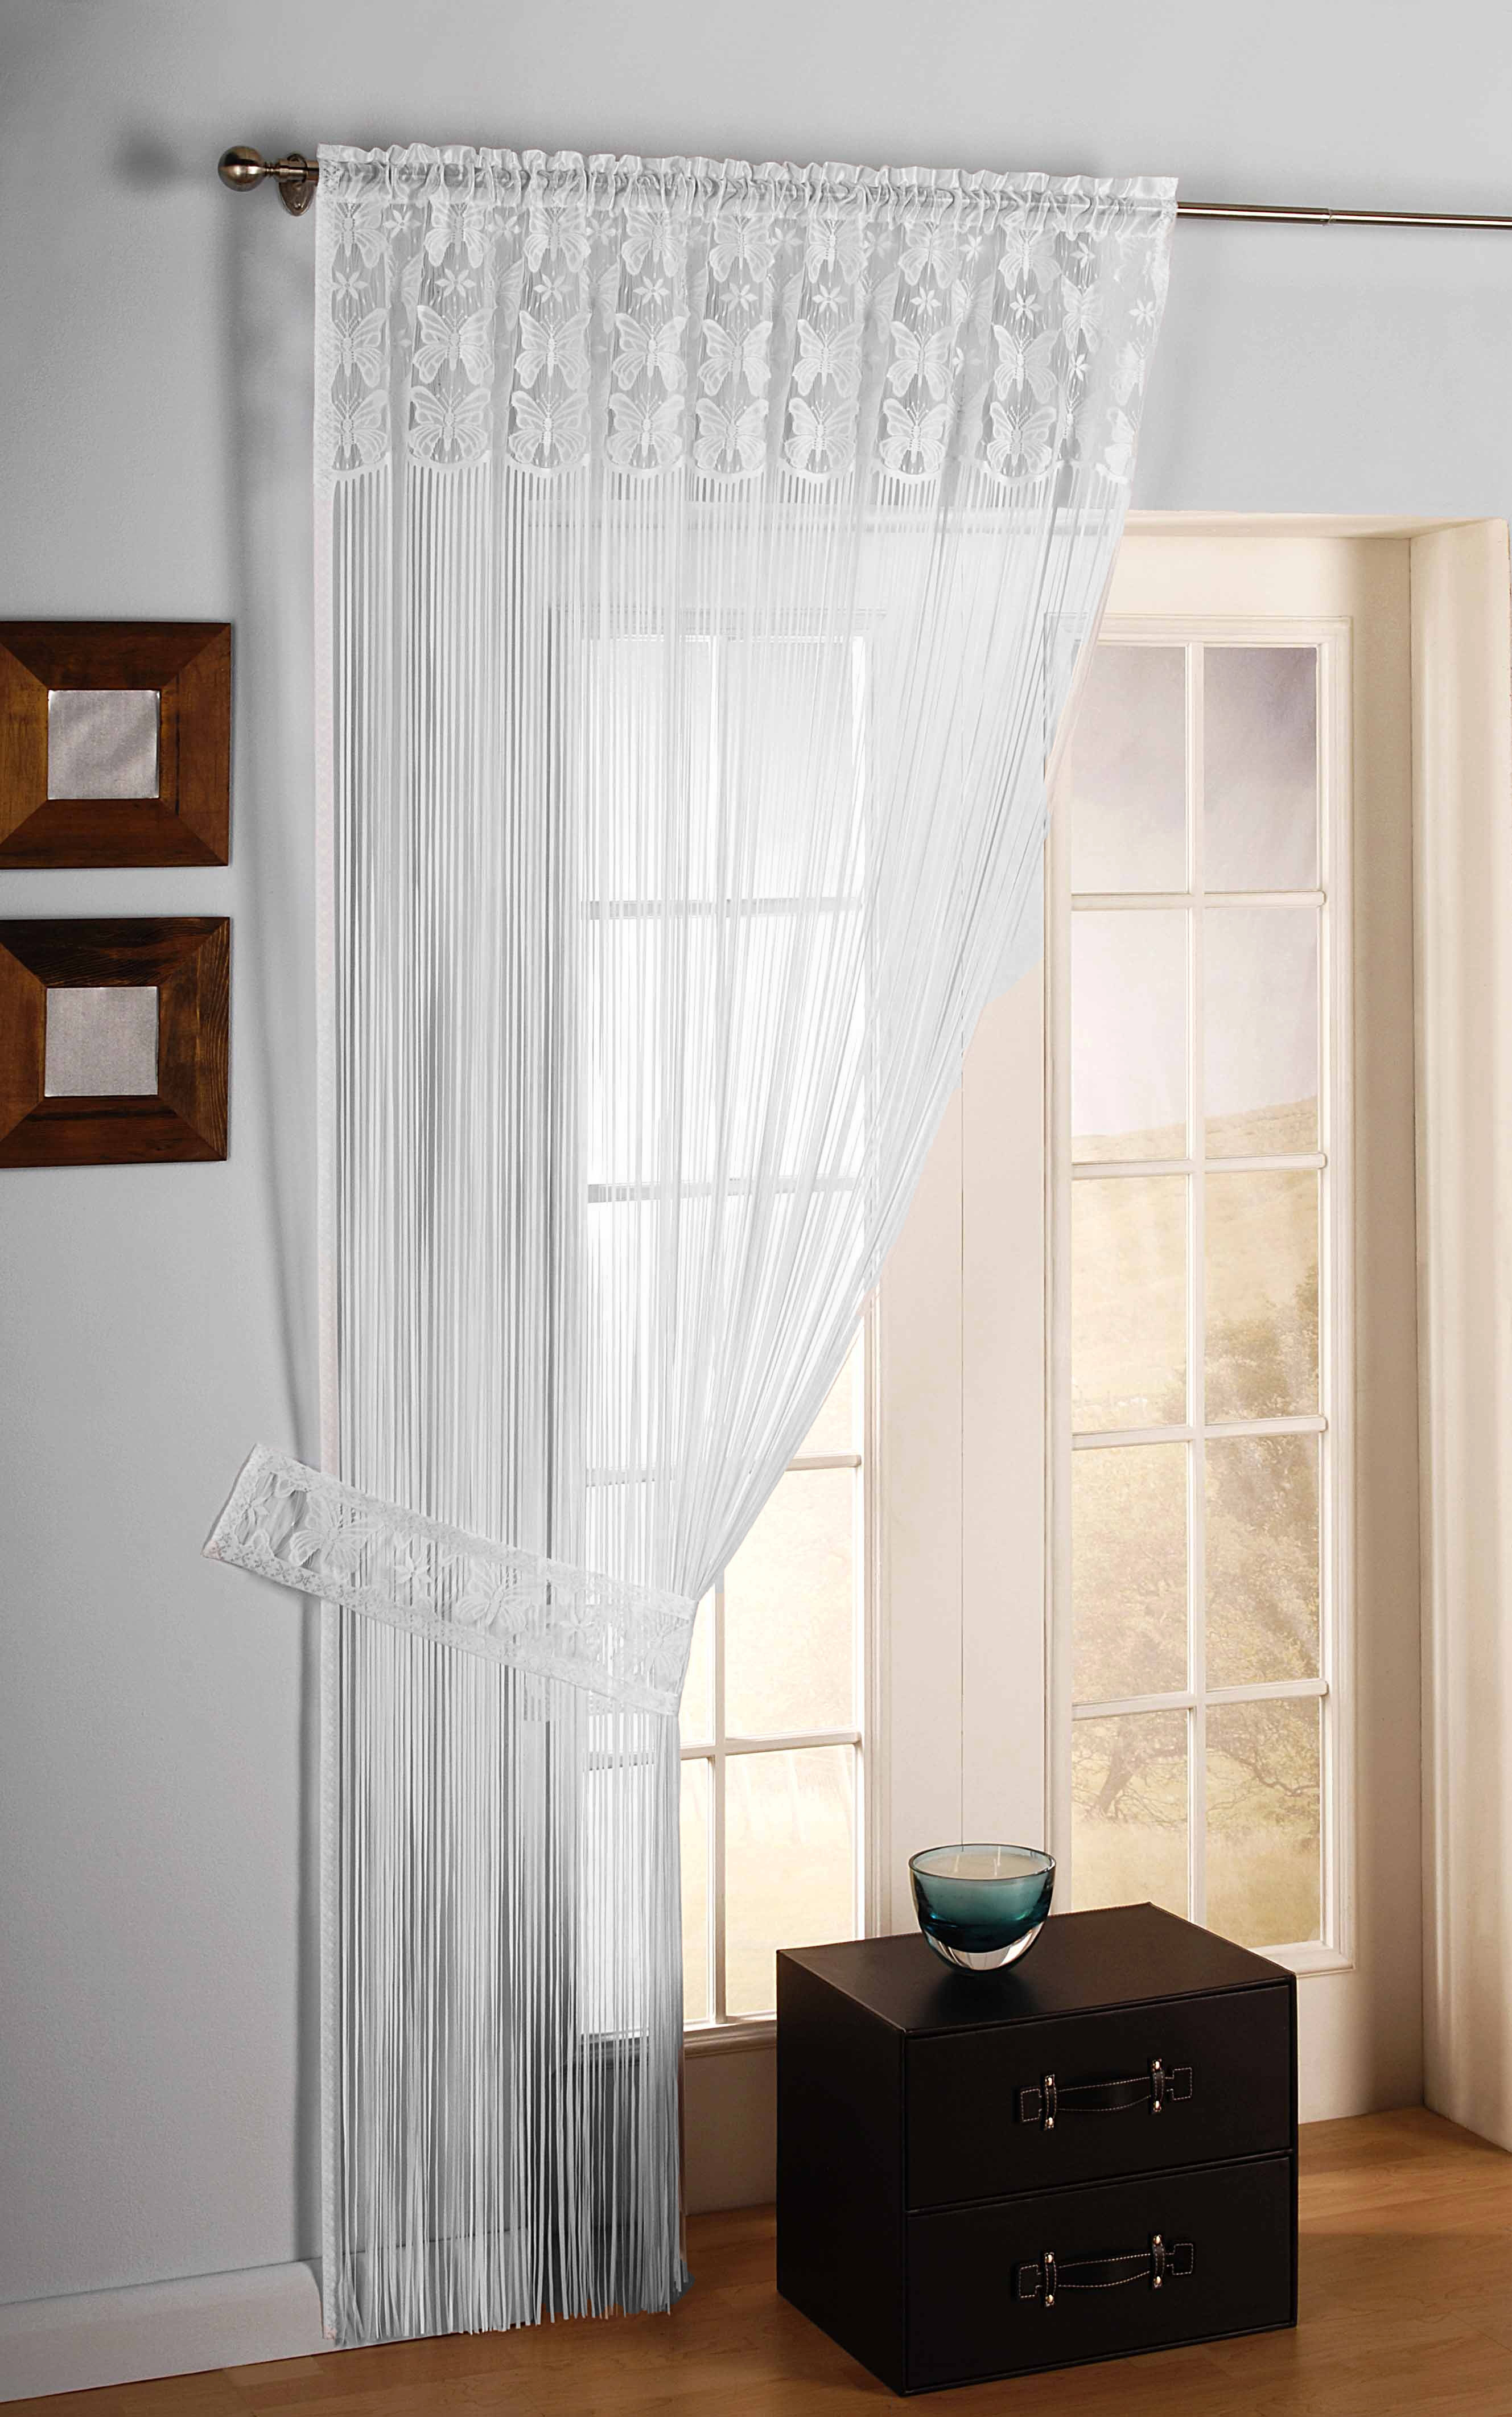 String Curtain Fringe Panel Decoration Room Divider 20: Wide String Curtain Door Window Divider Lace + Tie Back